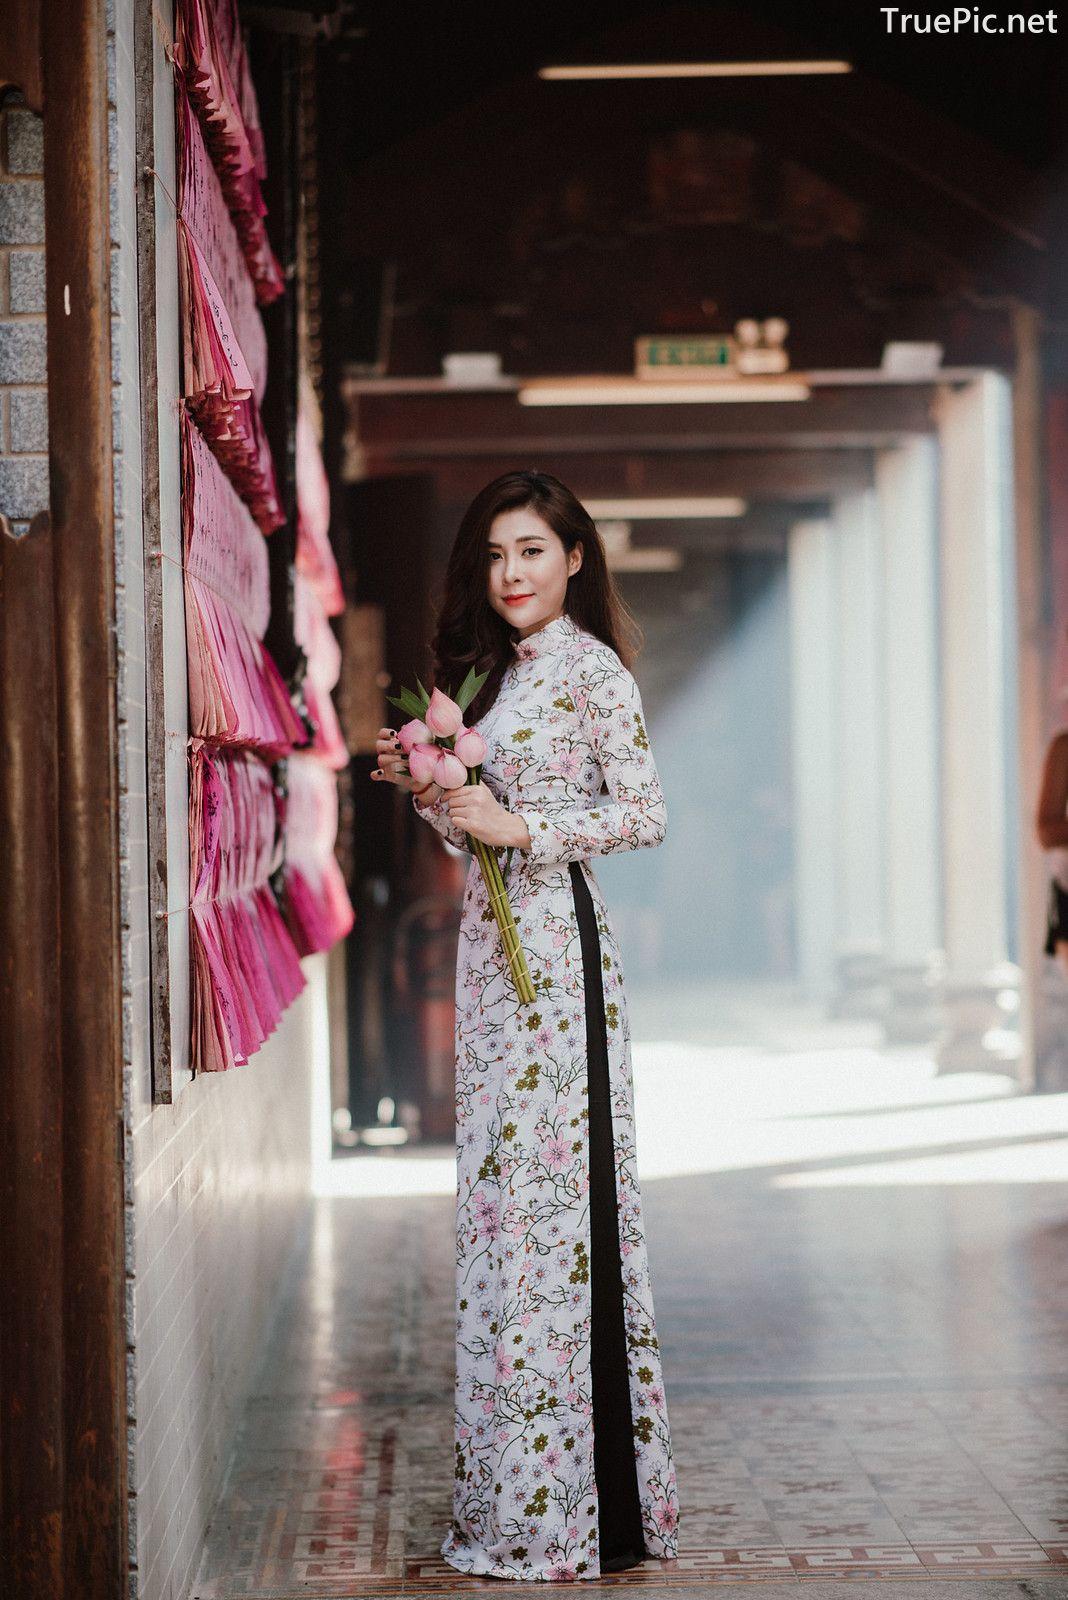 Image-Vietnamese-Beautiful-Girl-Ao-Dai-Vietnam-Traditional-Dress-by-VIN-Photo-3-TruePic.net- Picture-6